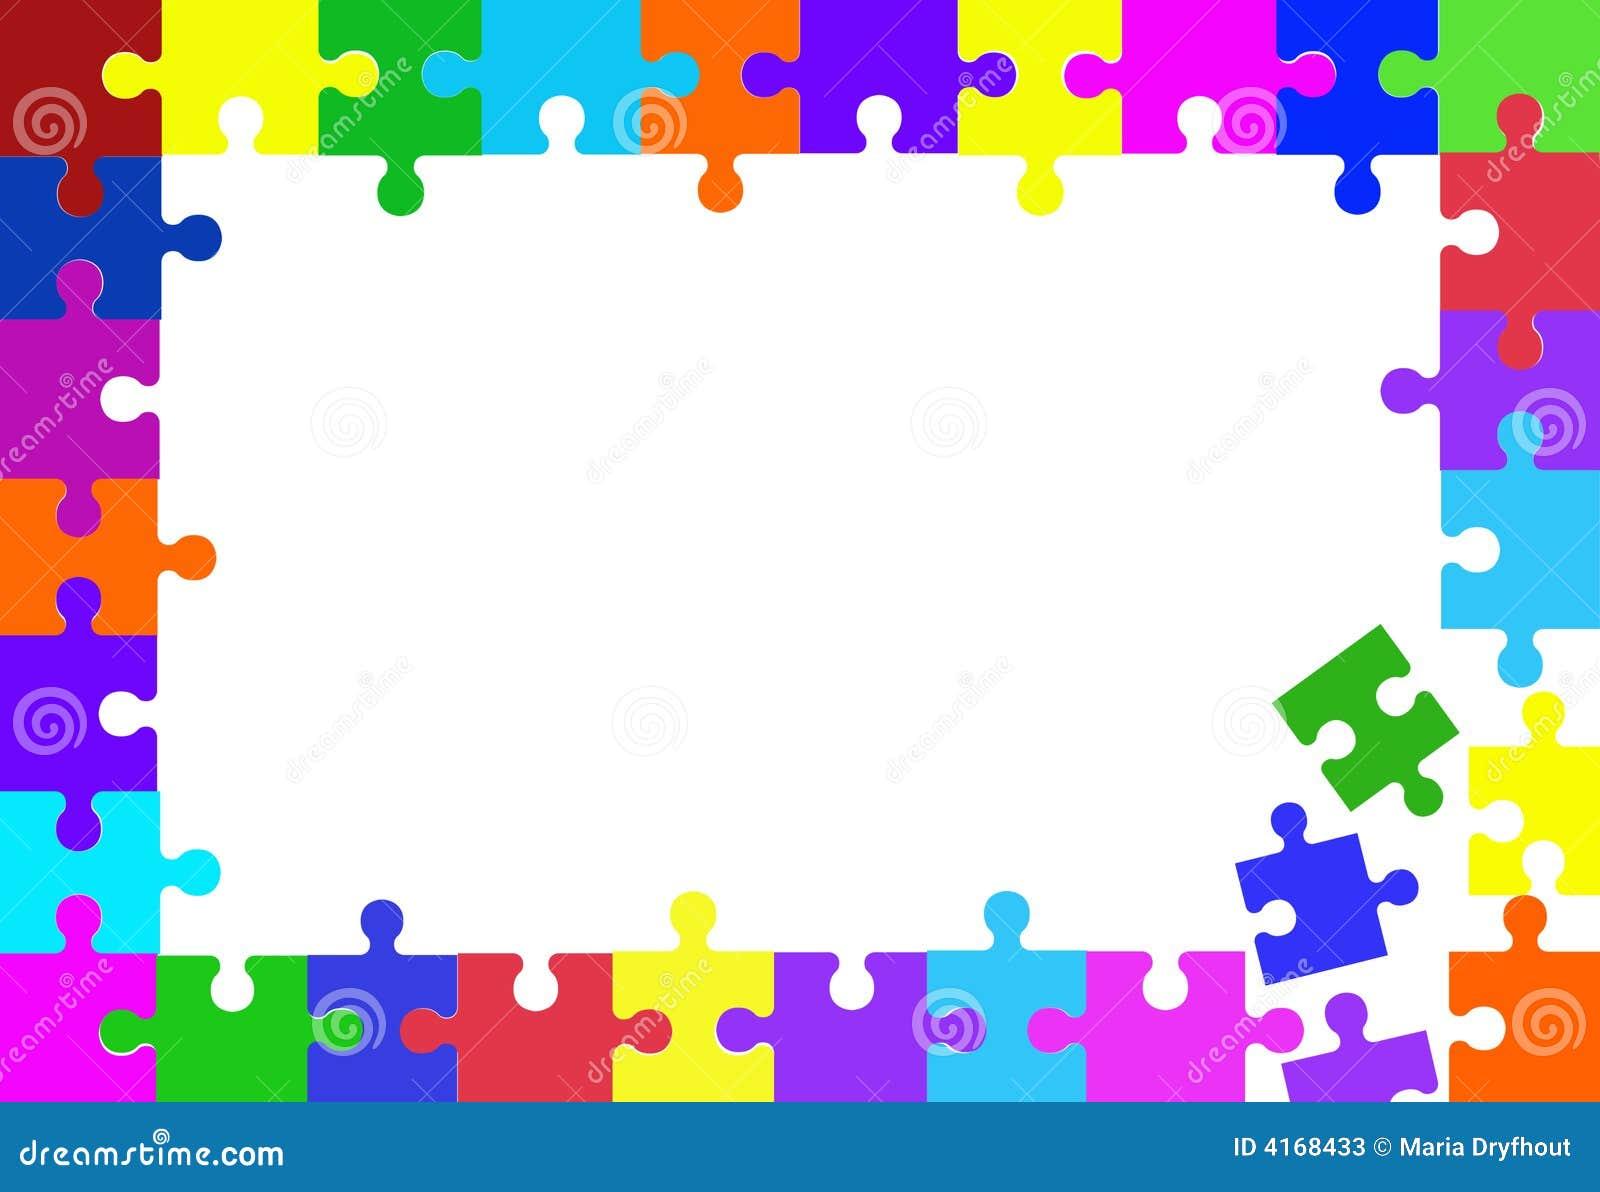 Jigsaw puzzle piece frame stock illustration image of - Puzzles decorativos ...